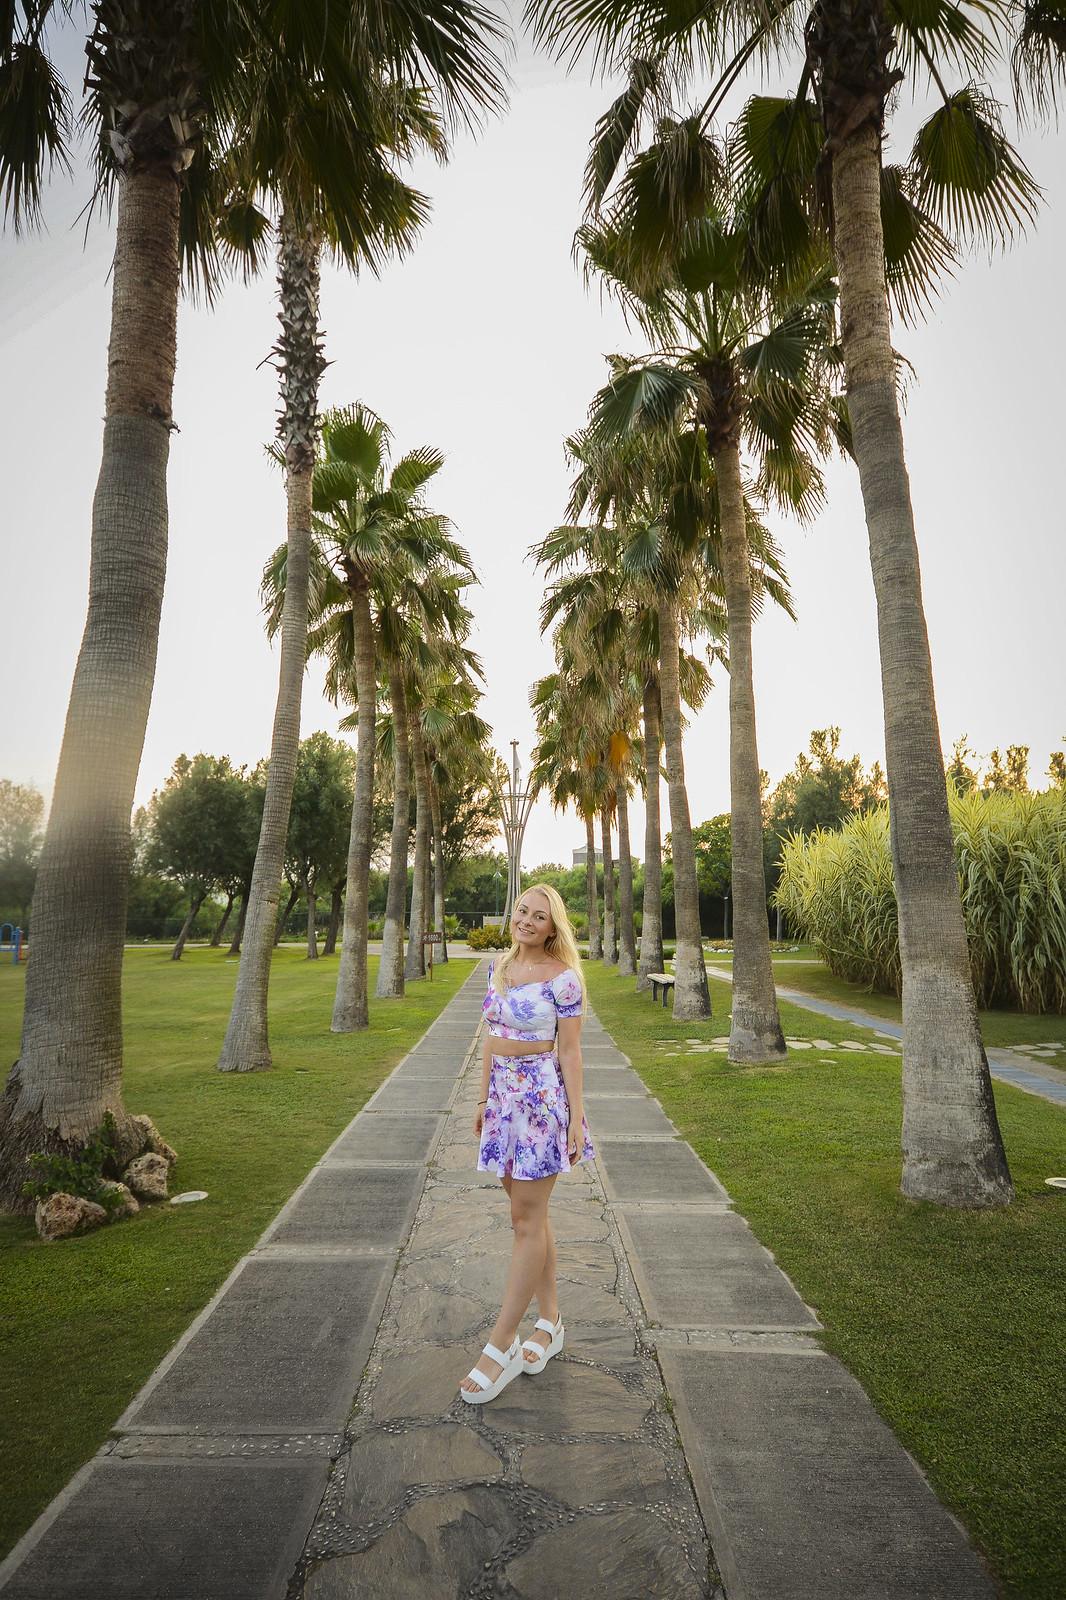 palmtrees_2